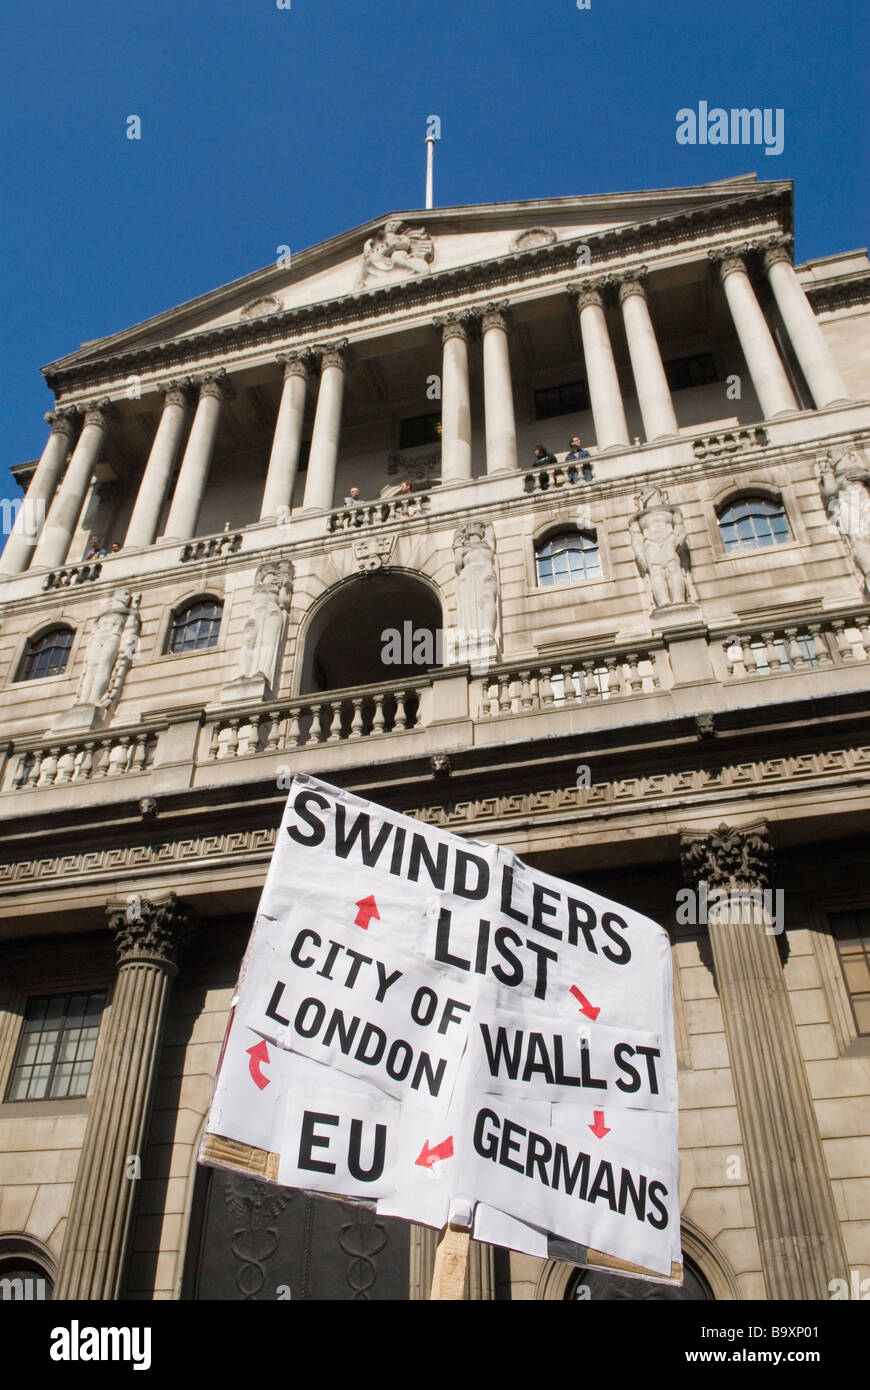 G20 protest outside bank of England Threadneedle Street. PHOTO HOMER SYKES - Stock Image